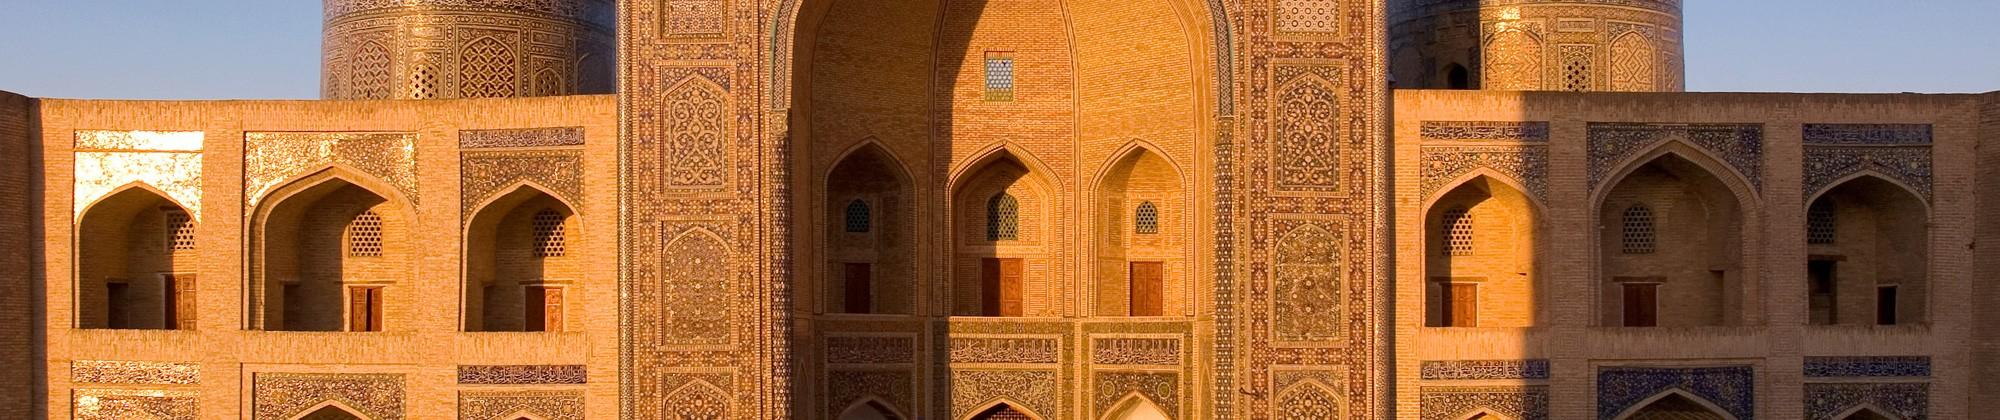 Tour to the Ancient Minarets - 1